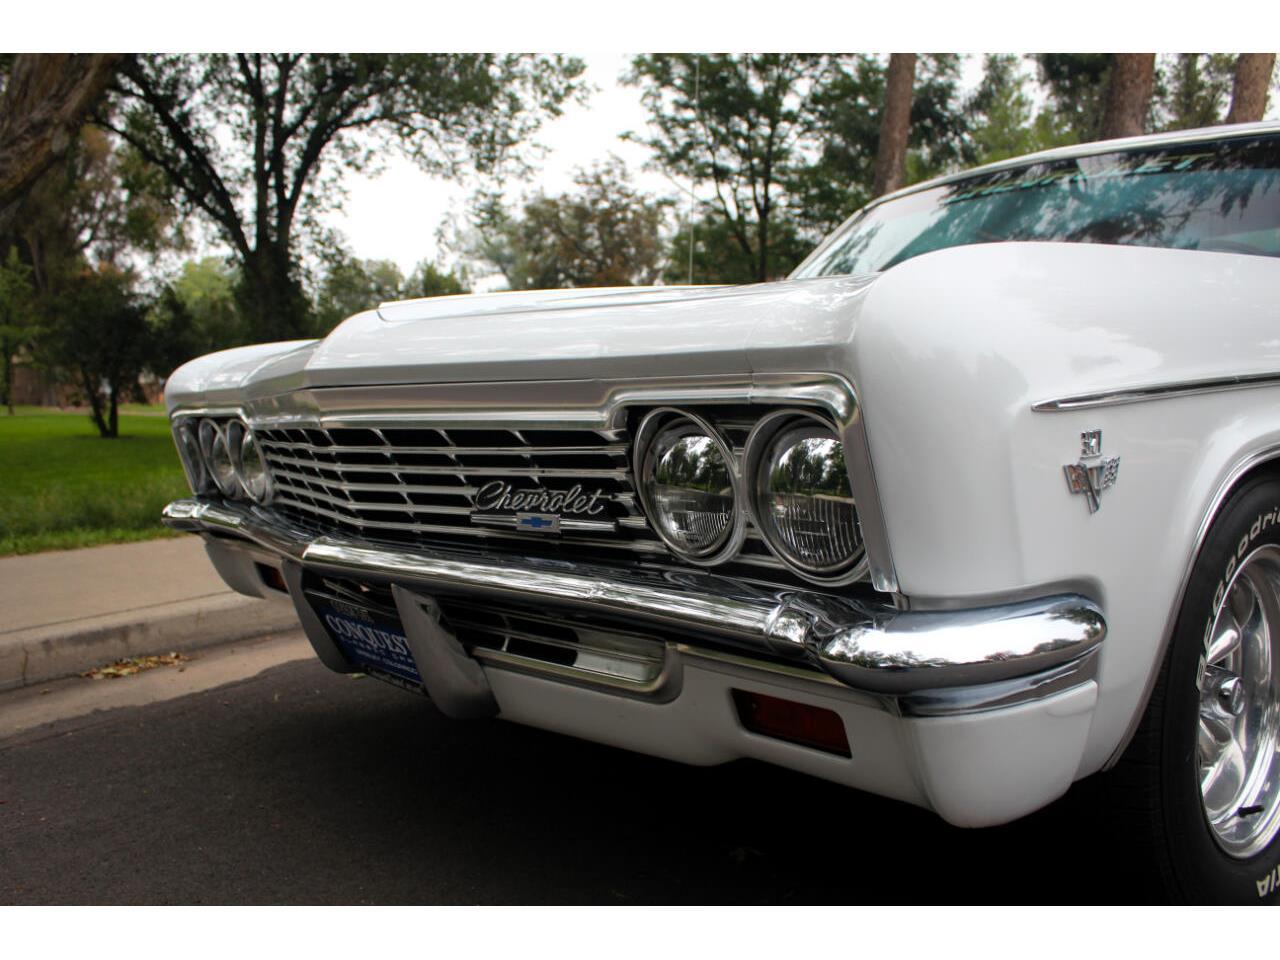 1966 Chevrolet Impala (CC-1391207) for sale in Greeley, Colorado